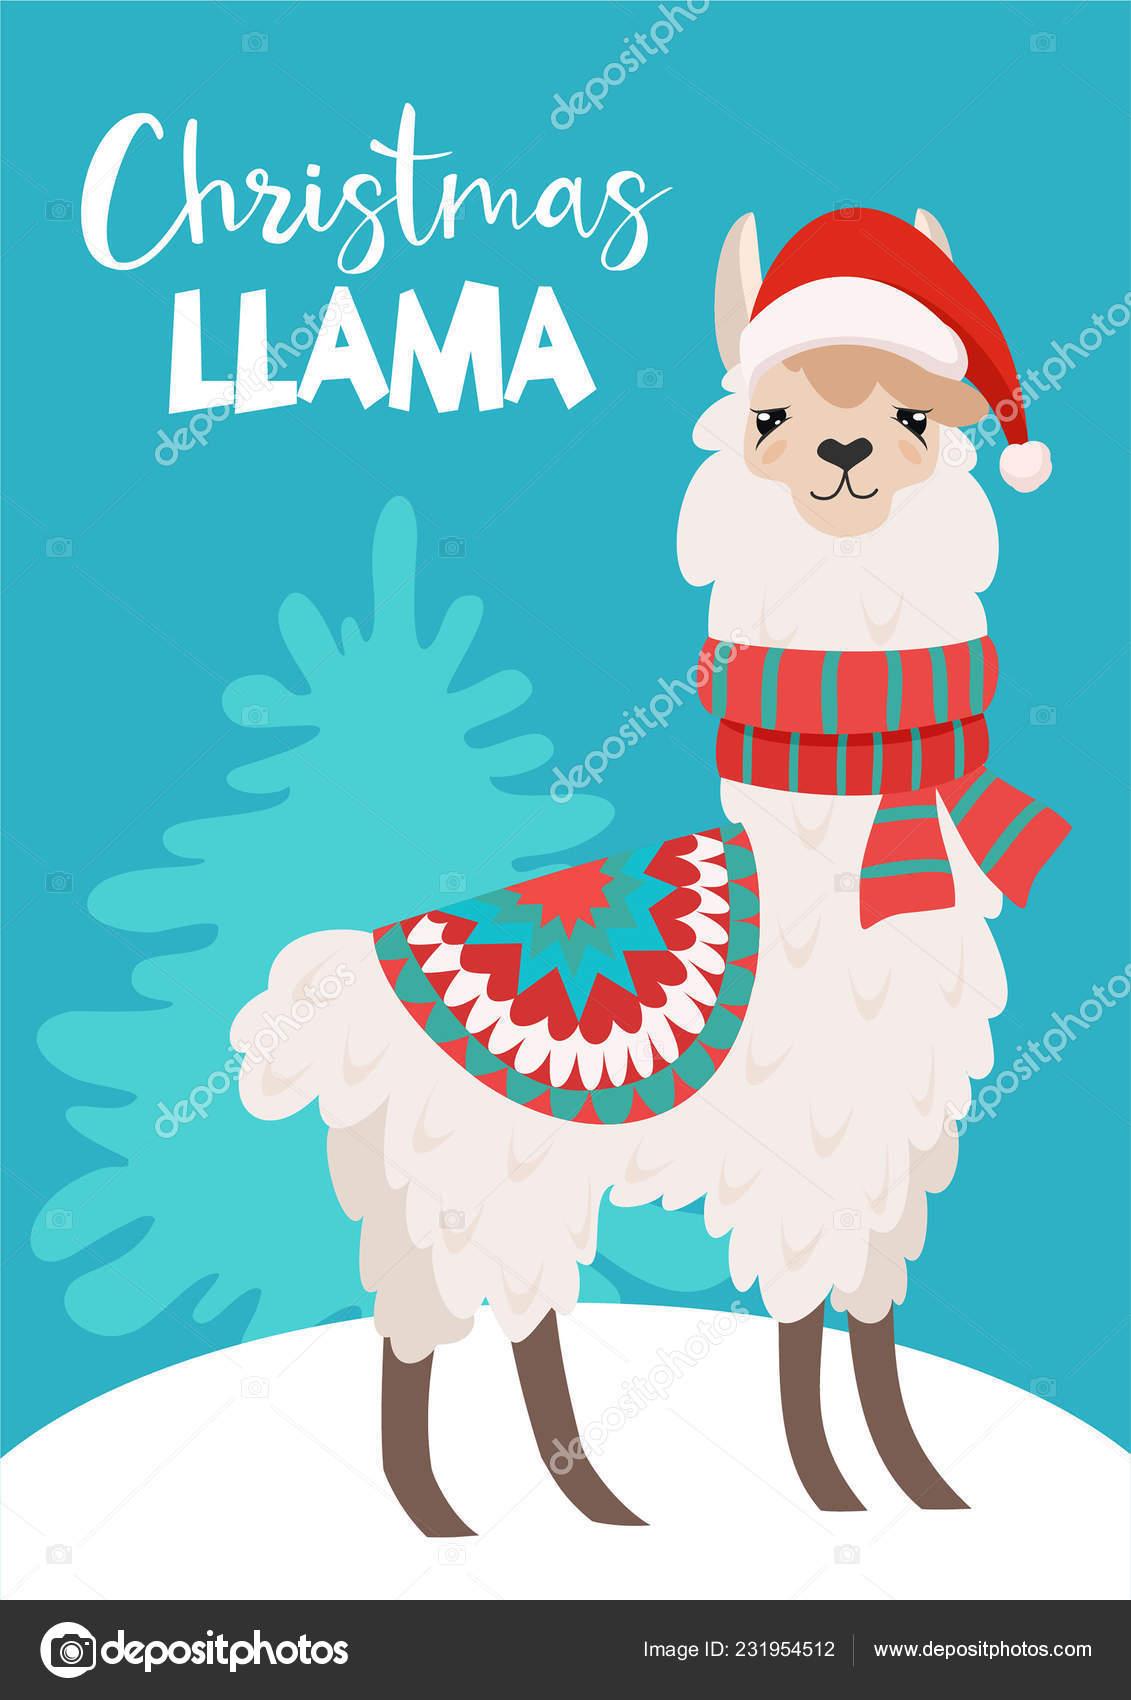 Christmas Llama.Funny Winter Card Cartoon Llama Vector Christmas